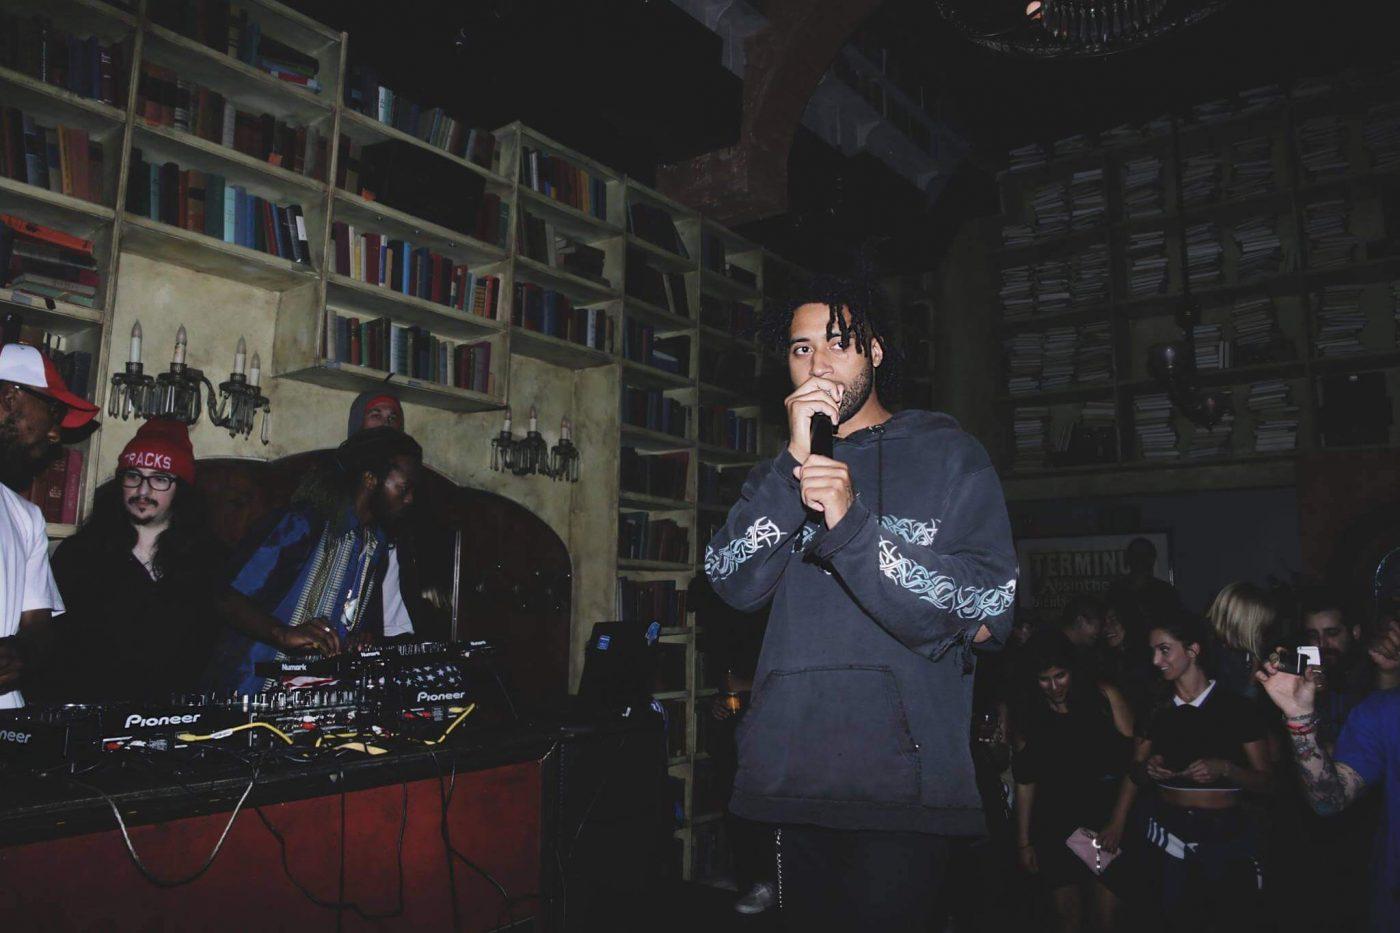 Este artista hace retratos de DJs usando únicamente emojis